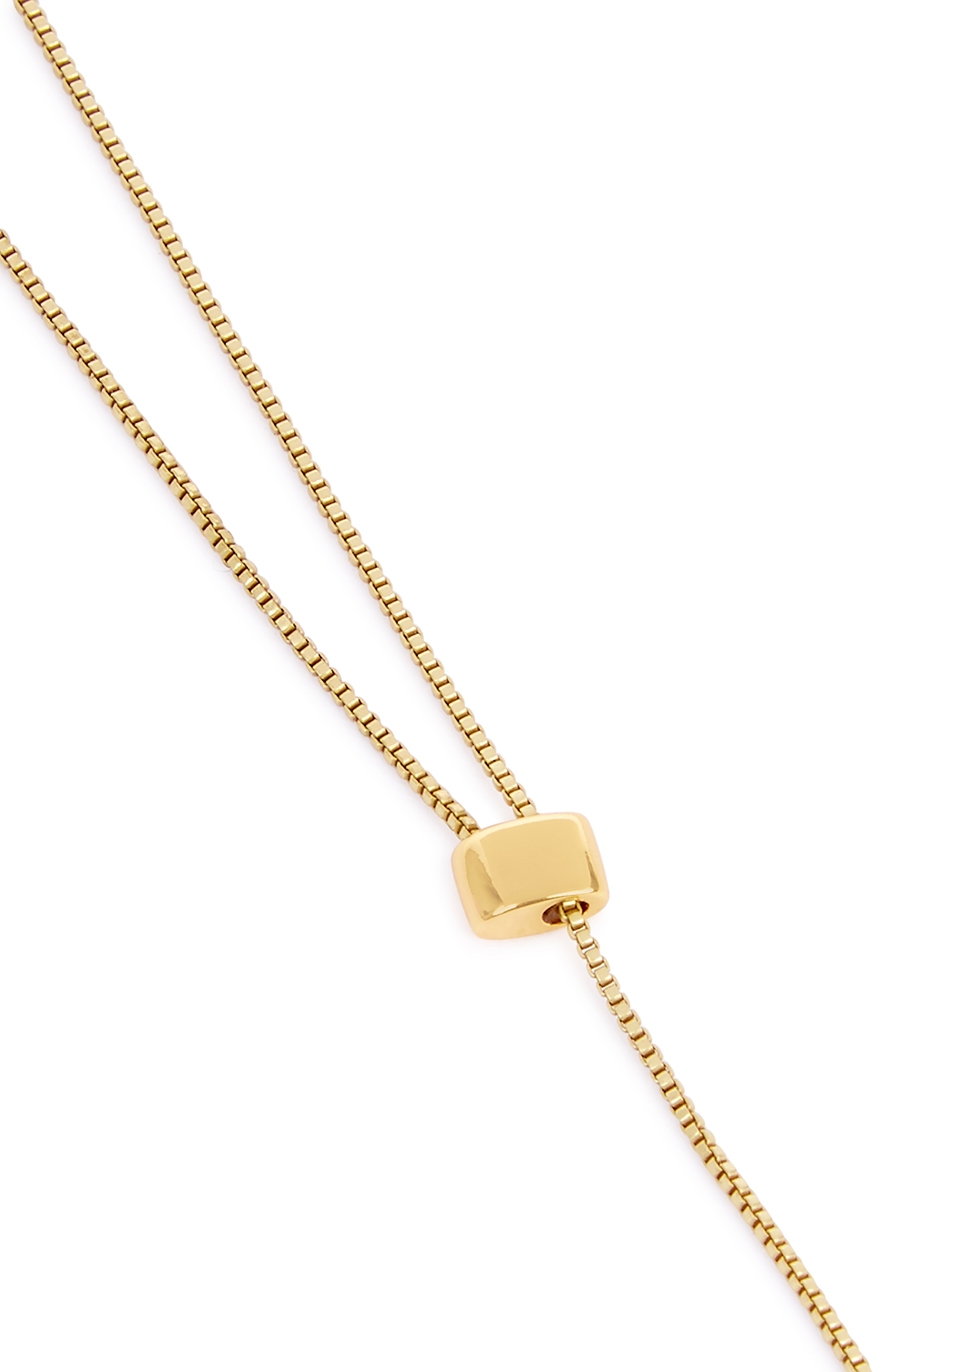 Trust 14kt gold-dipped necklace - JENNY BIRD